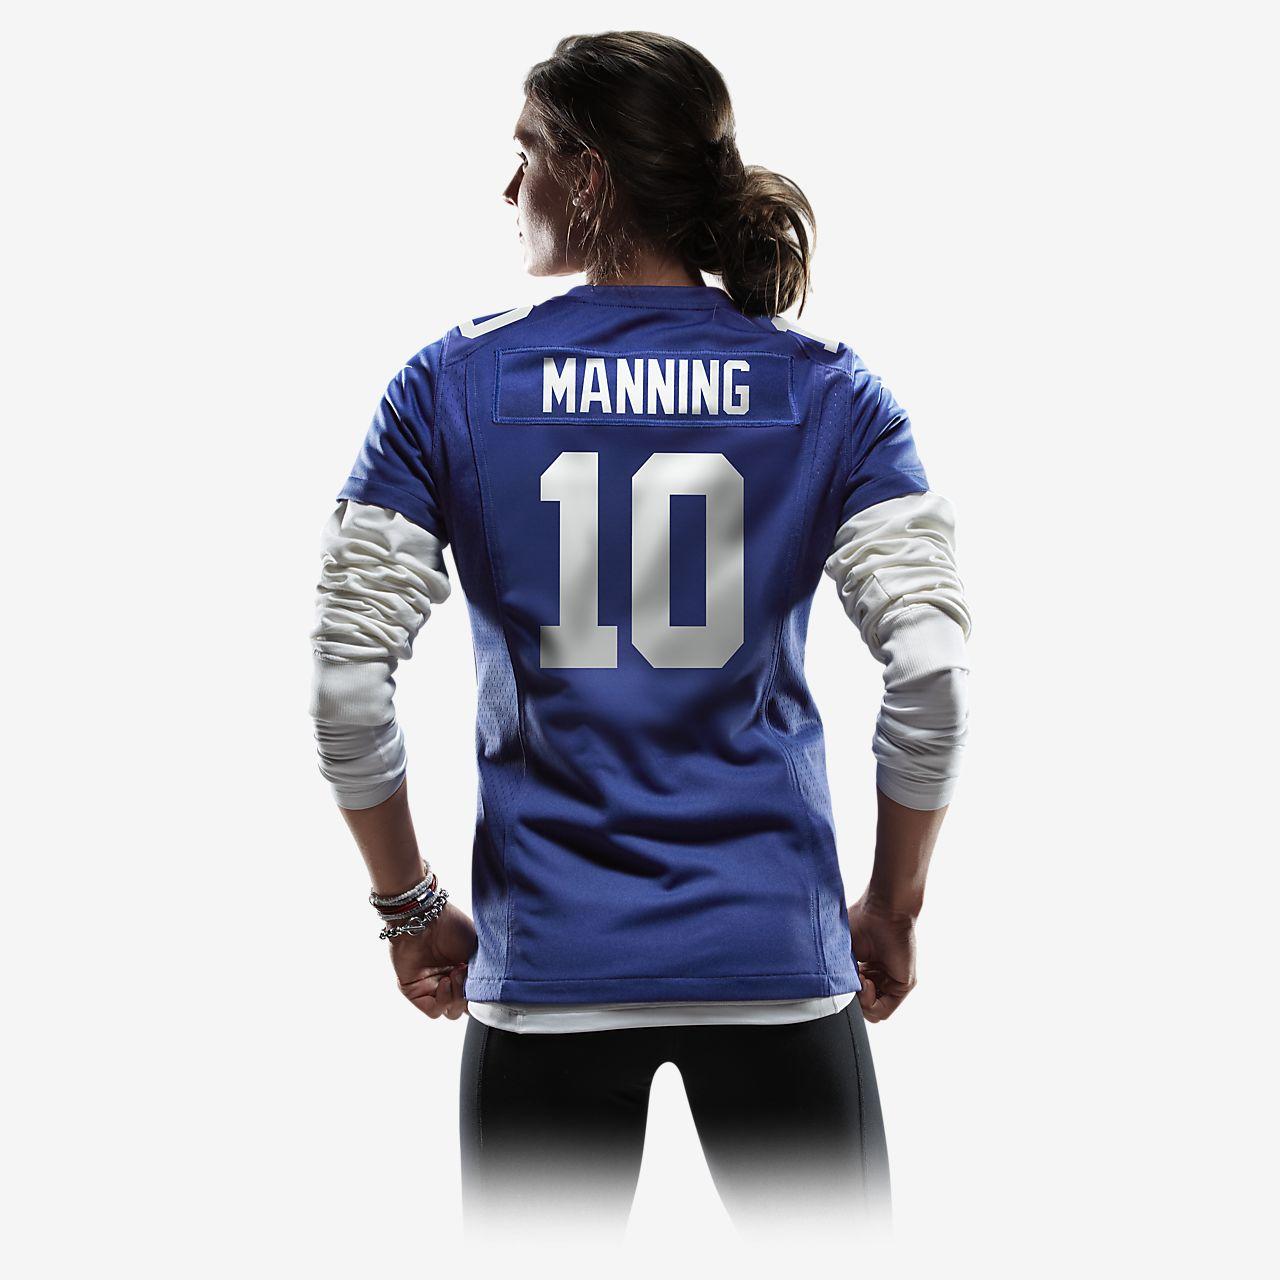 ... NFL New York Giants (Eli Manning) Camiseta de fútbol americano de la 1ª  equipación d4d8b8ffc56ce